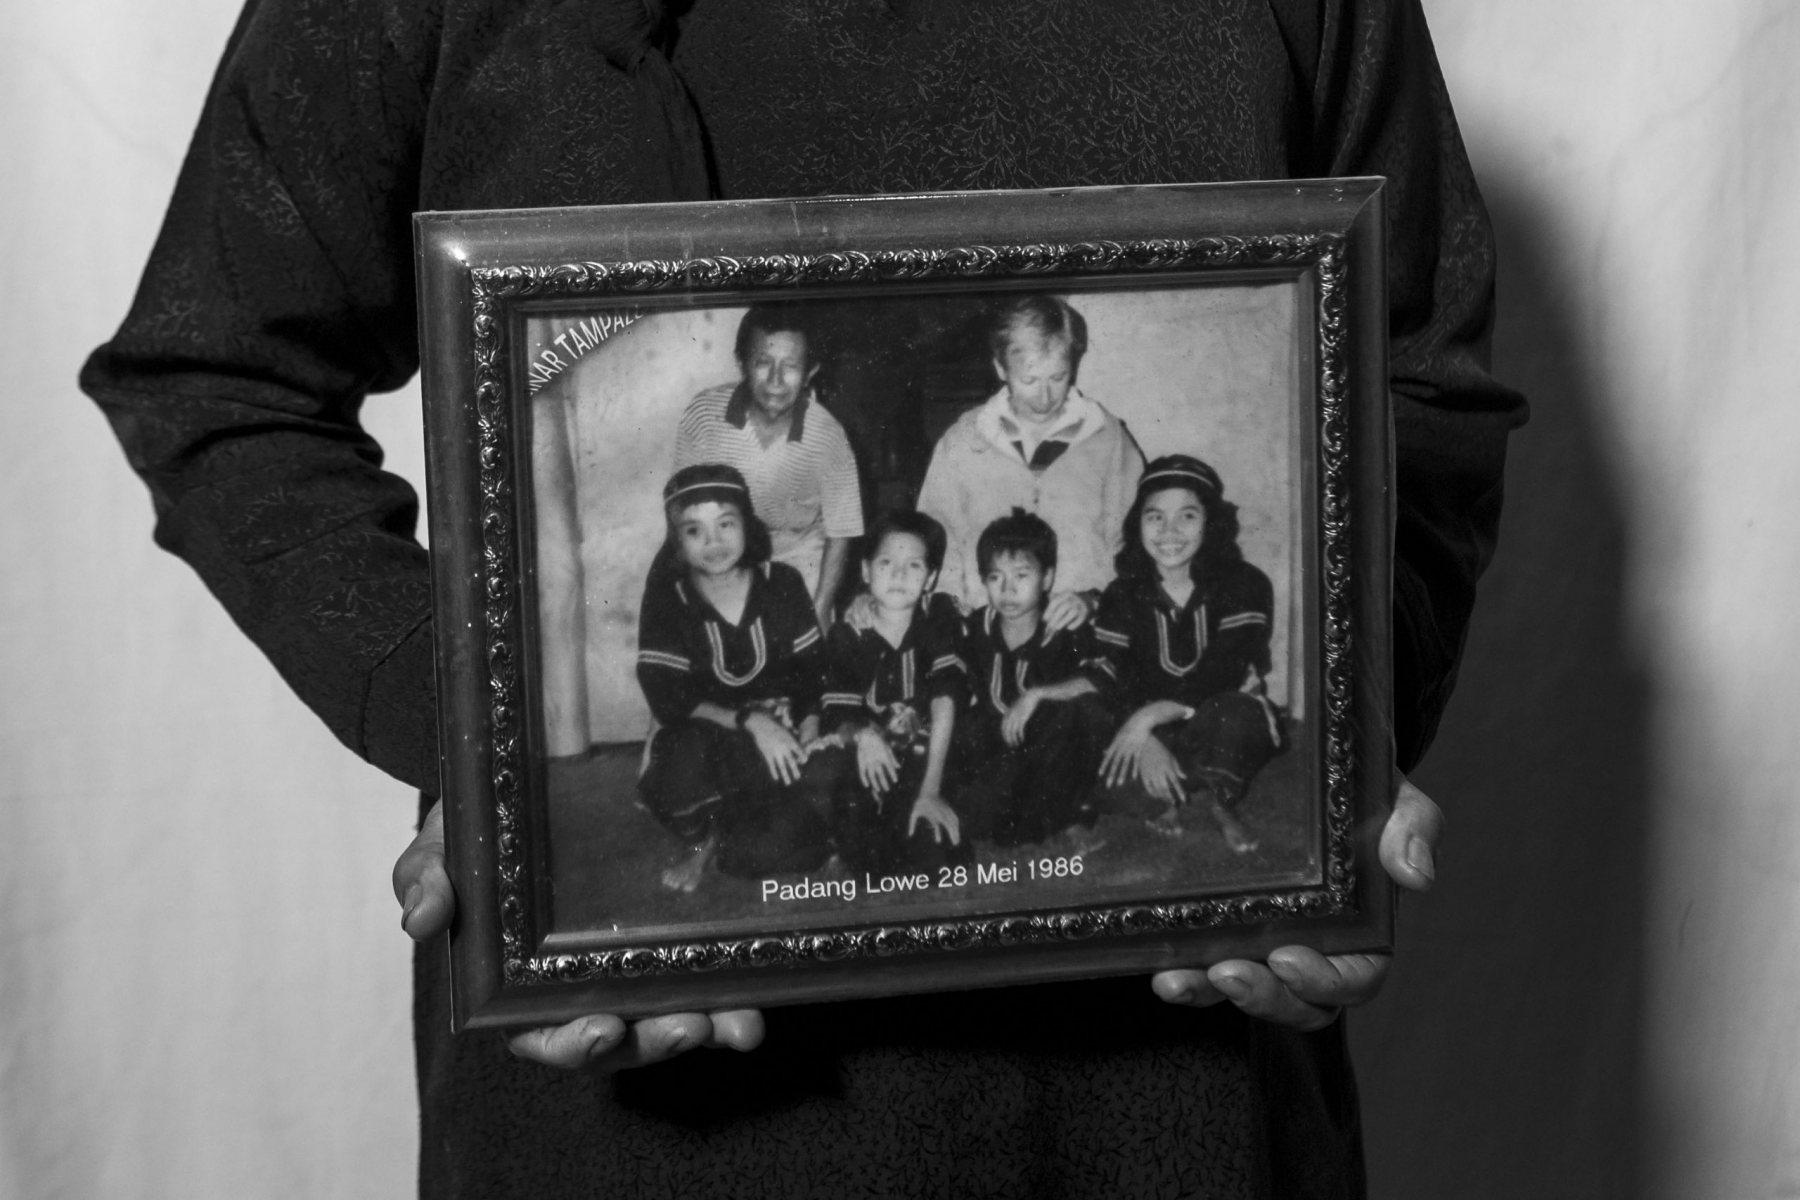 Sebuah foto lama yang merekam memori tentang orang-orang di Padang Lowe, Sumatera Barat yang pernah didatangi oleh bule-bule yang ingin belajar silat. Silat memang sejak lama telah menarik banyak perhatian dari dunia luar.